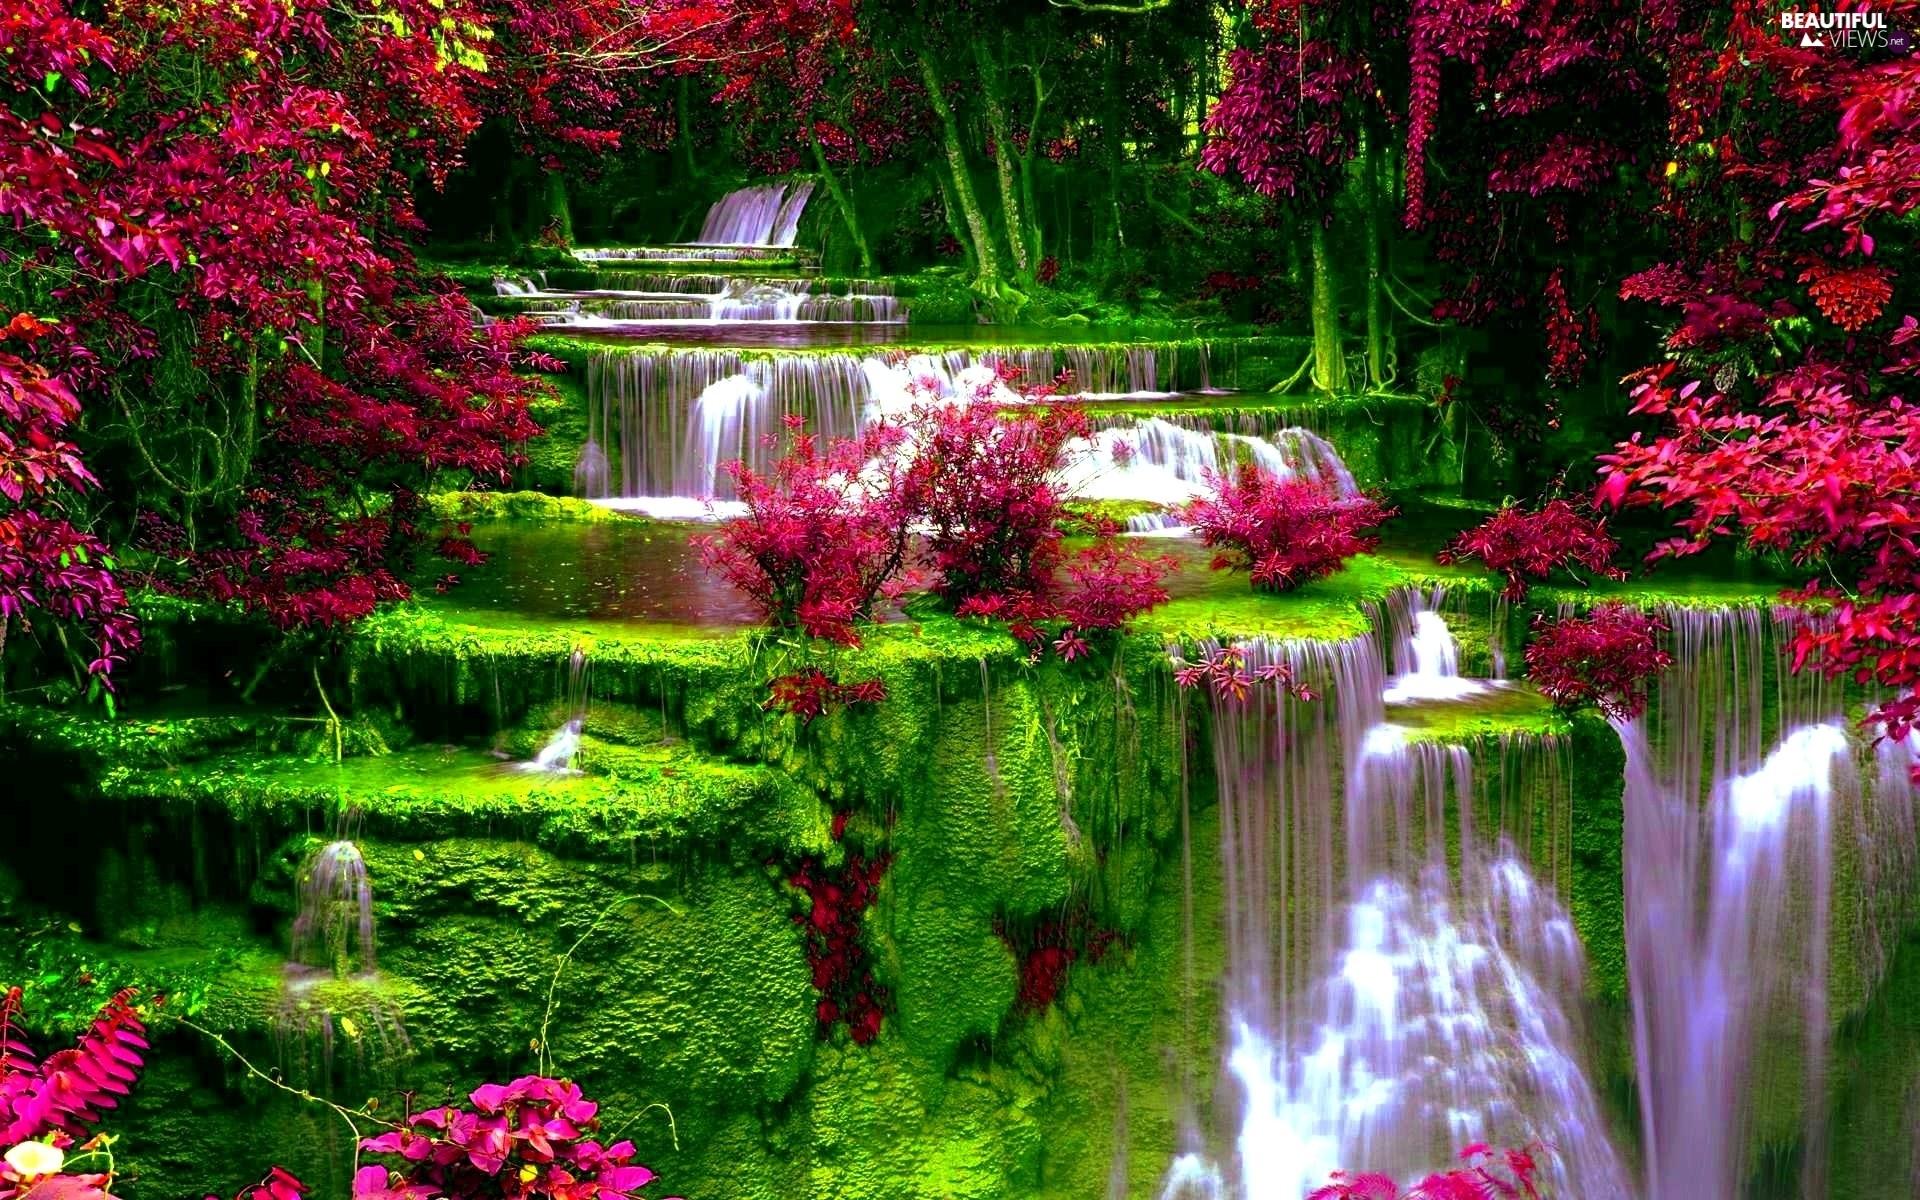 Flowers VEGETATION waterfall Beautiful views